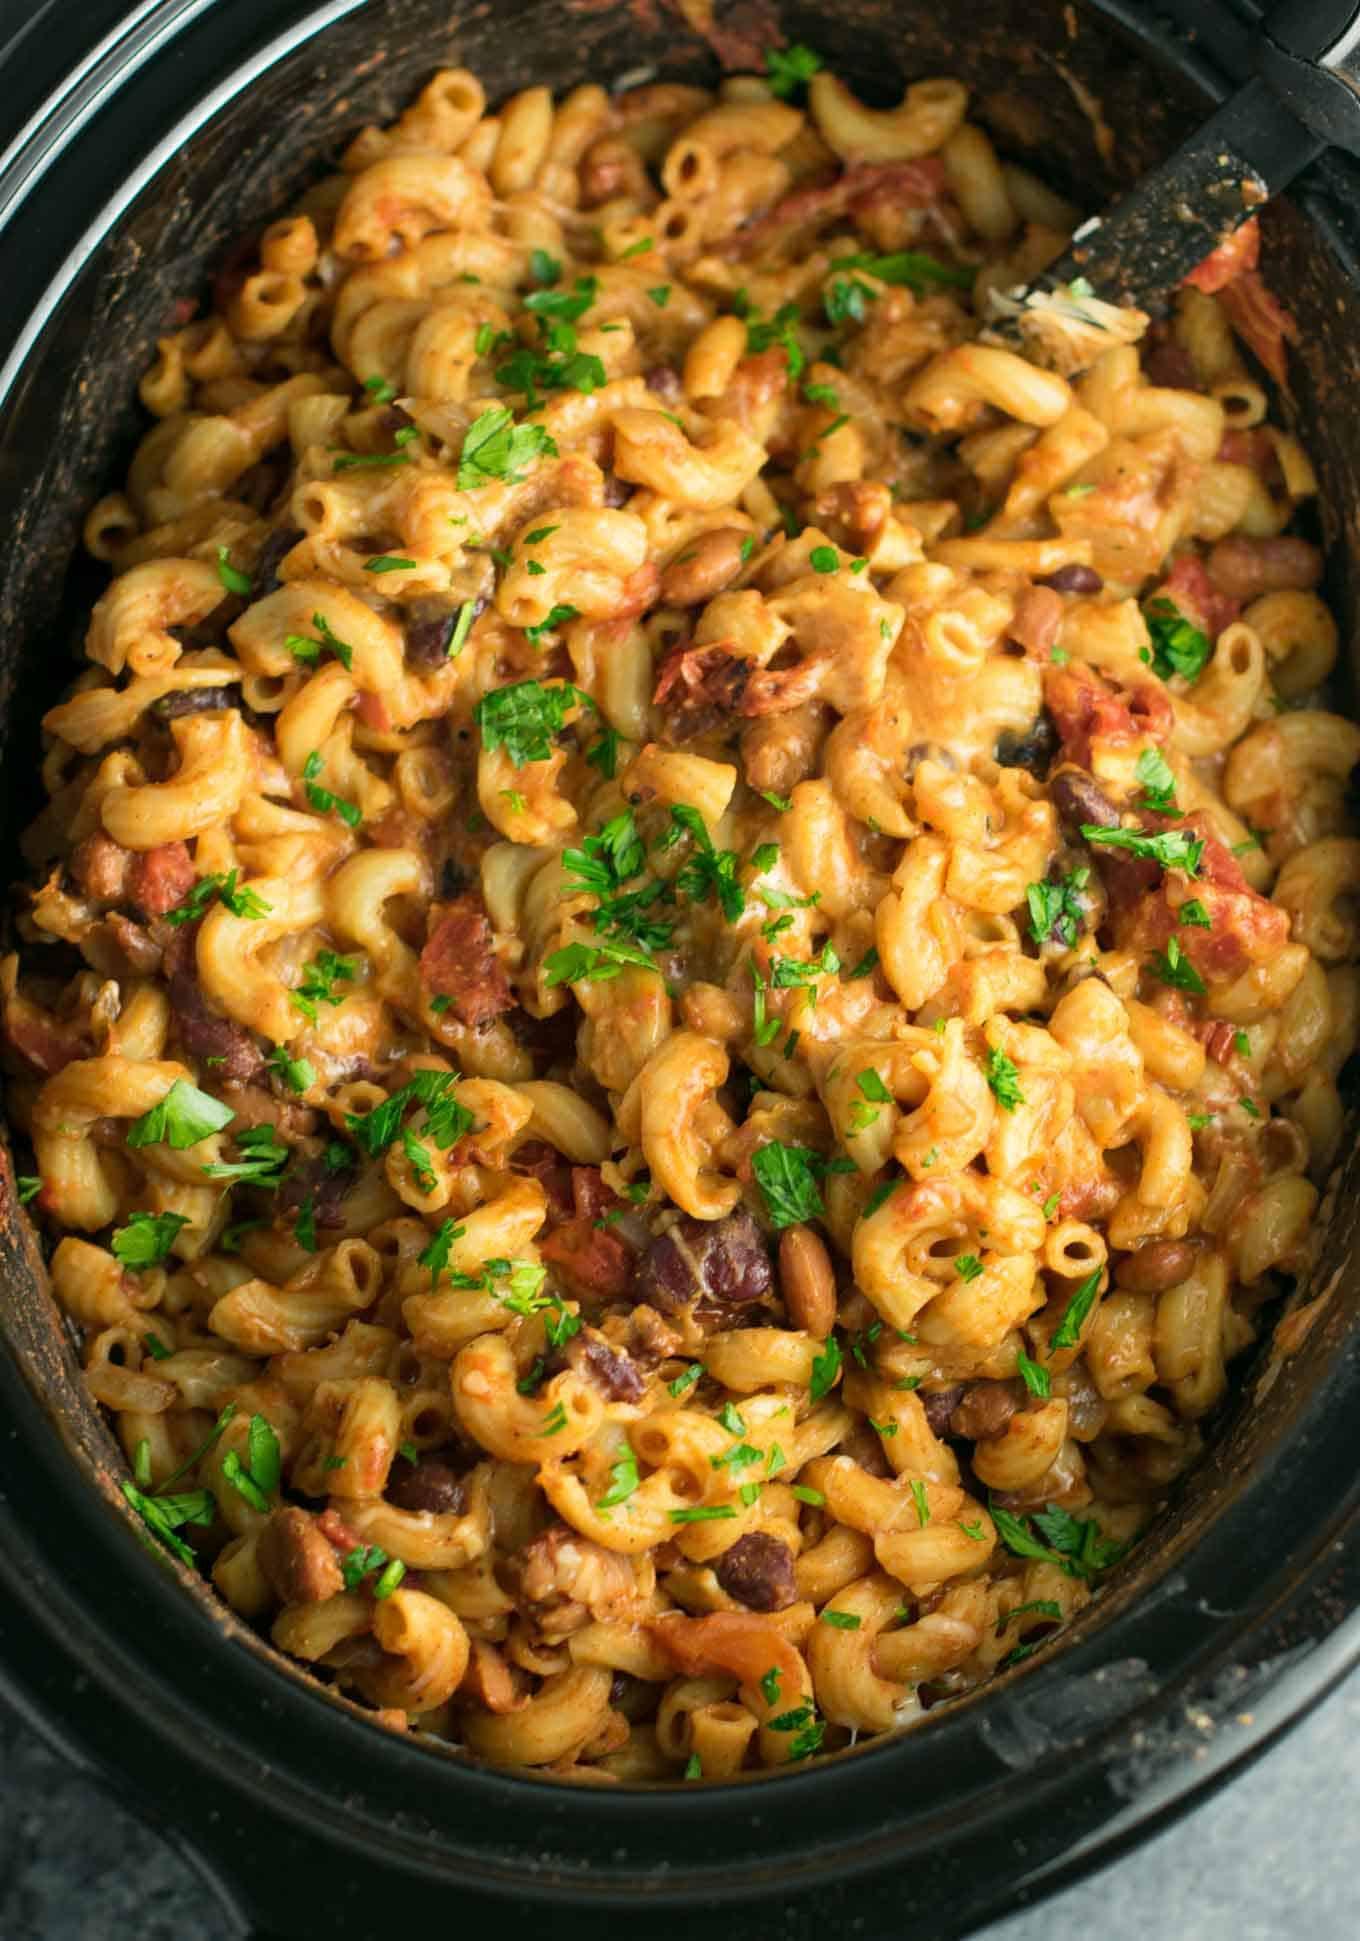 Crockpot Vegetarian Recipes  Slow Cooker Ve arian Chili Mac Recipe Build Your Bite